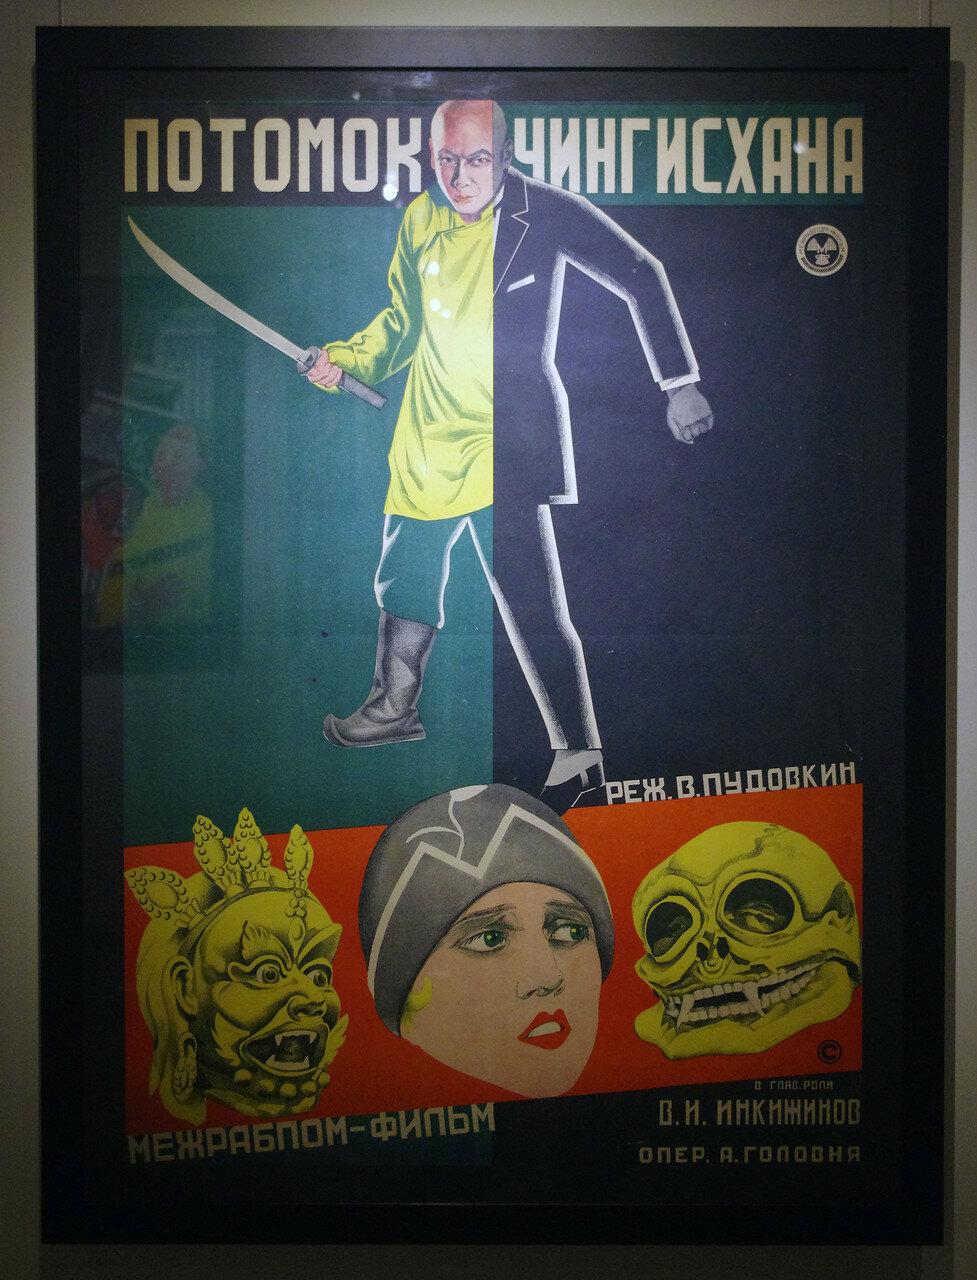 Семен Абрамович Семенов-Менес. Плакат к фильму «Потомок Чингисхана»